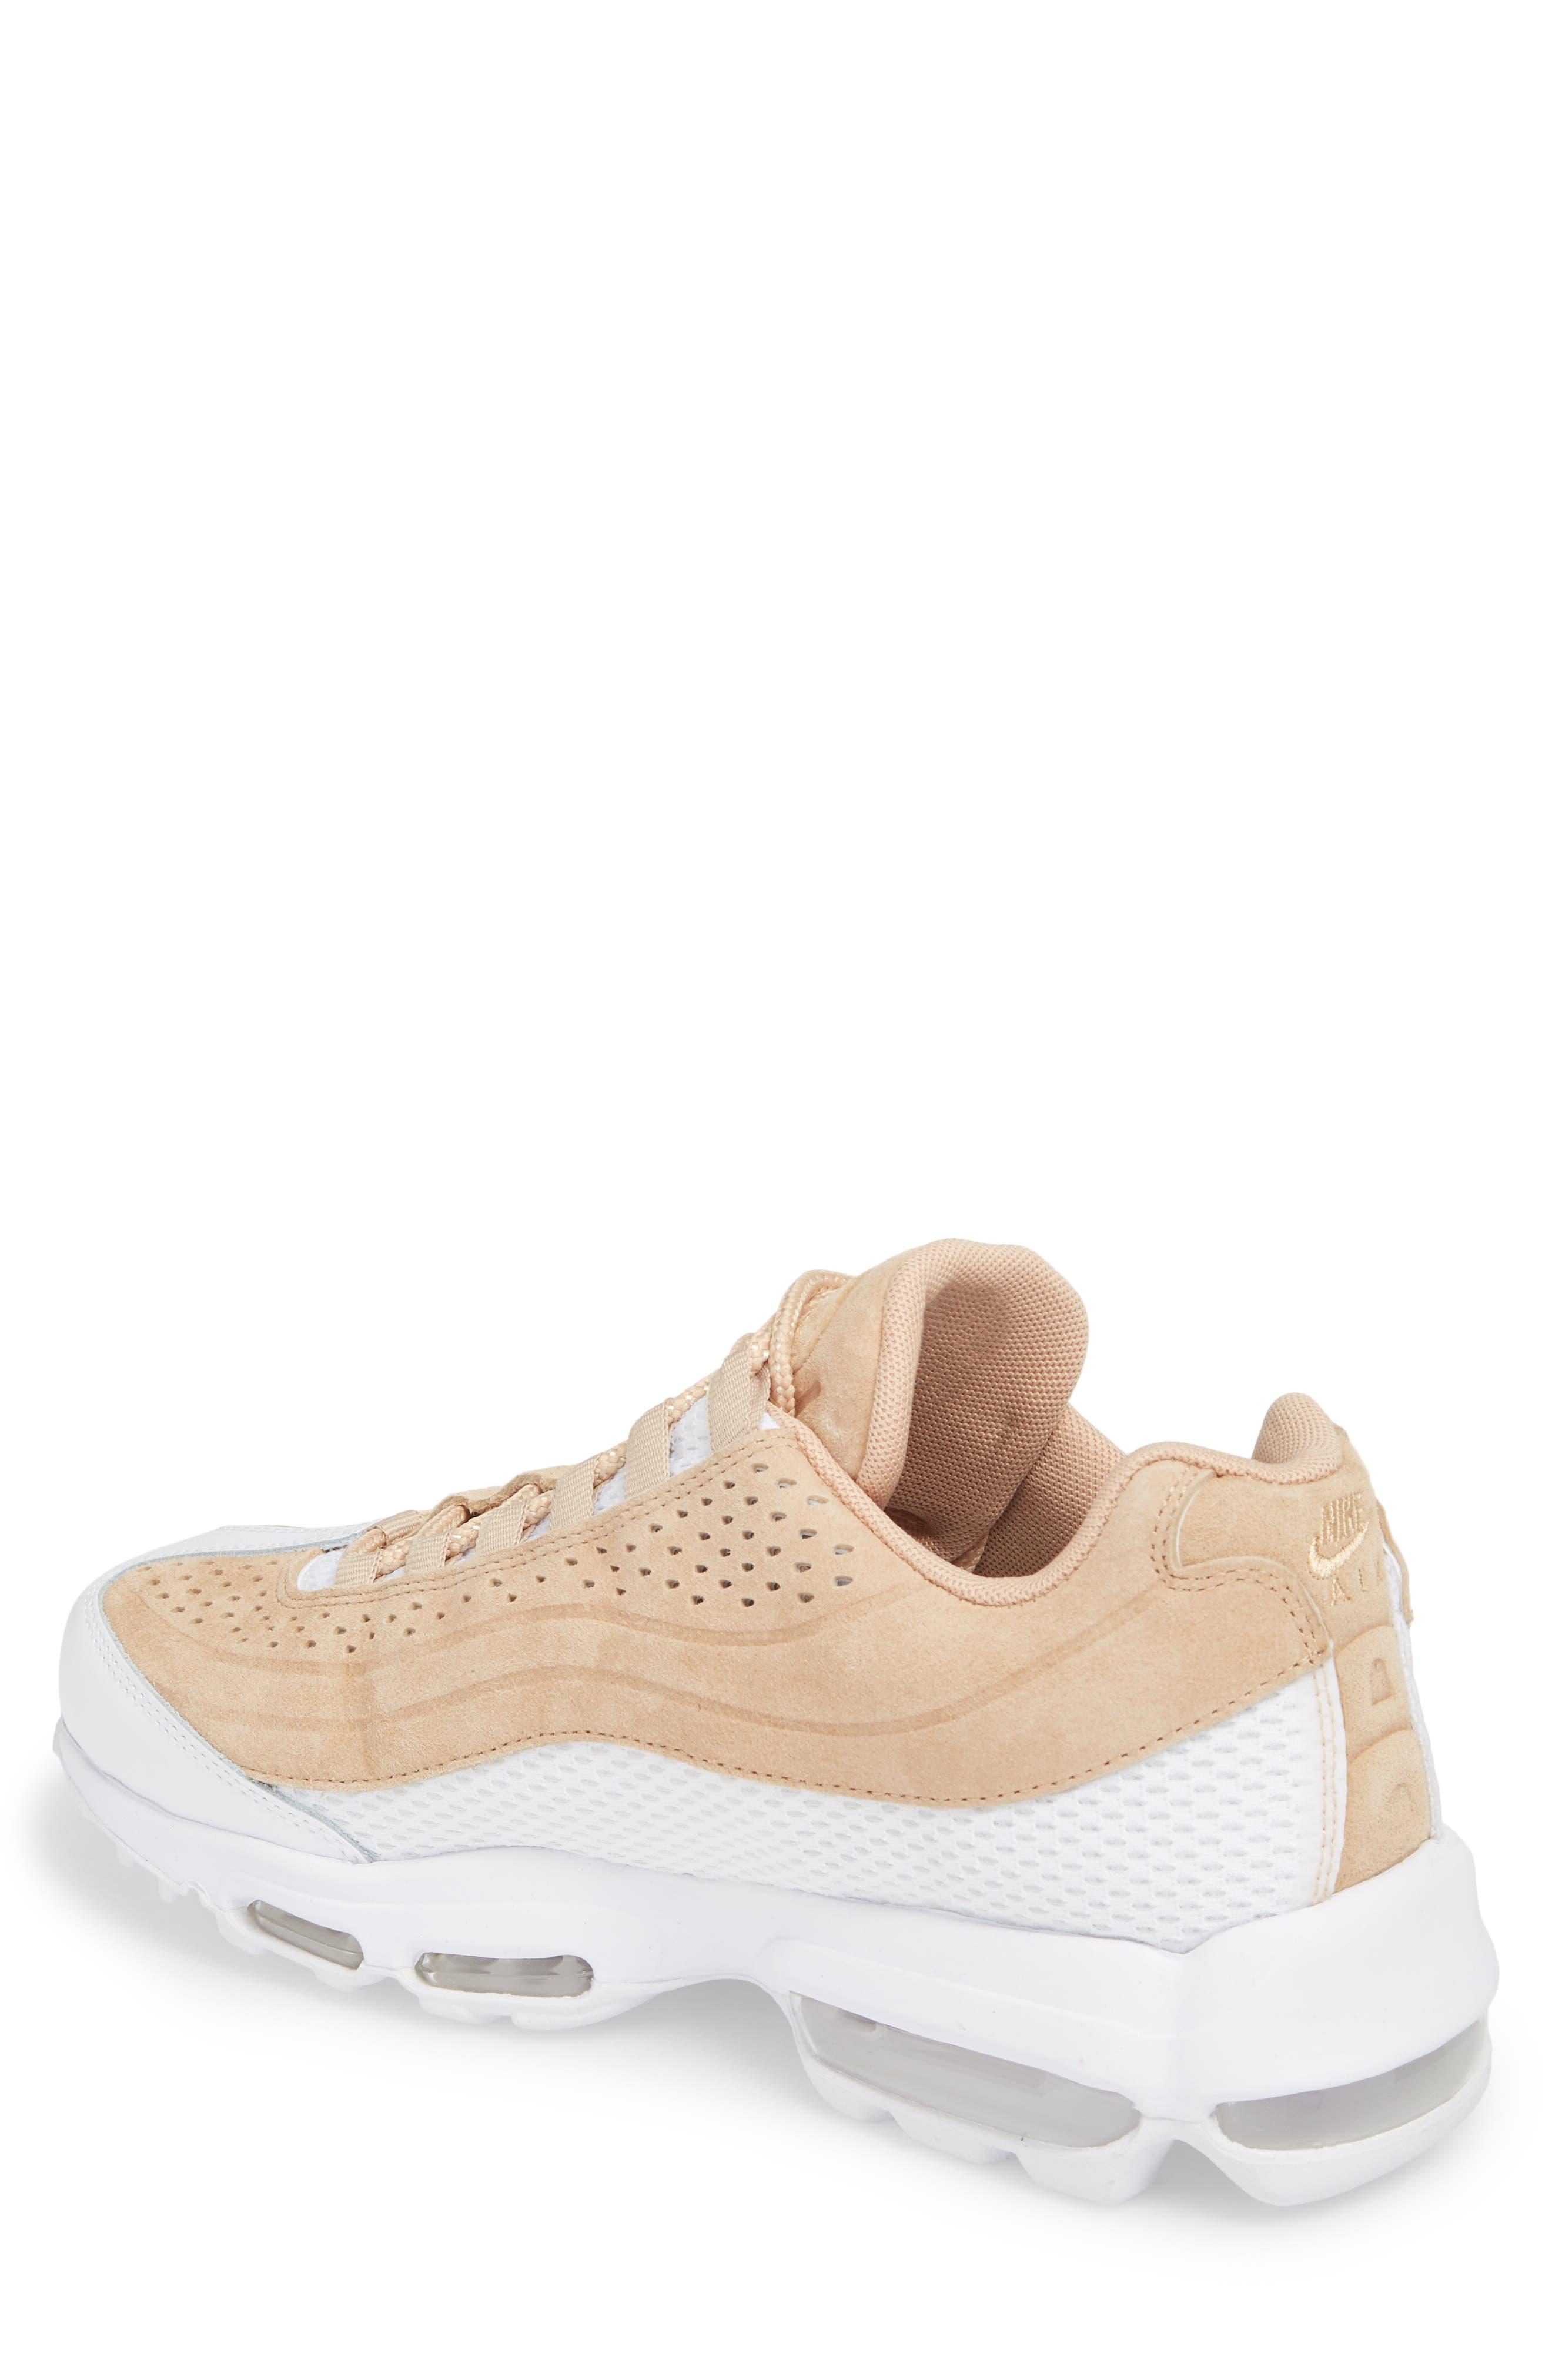 Air Max 95 Ultra Premium Sneaker,                             Alternate thumbnail 2, color,                             Vachetta Tan/ White